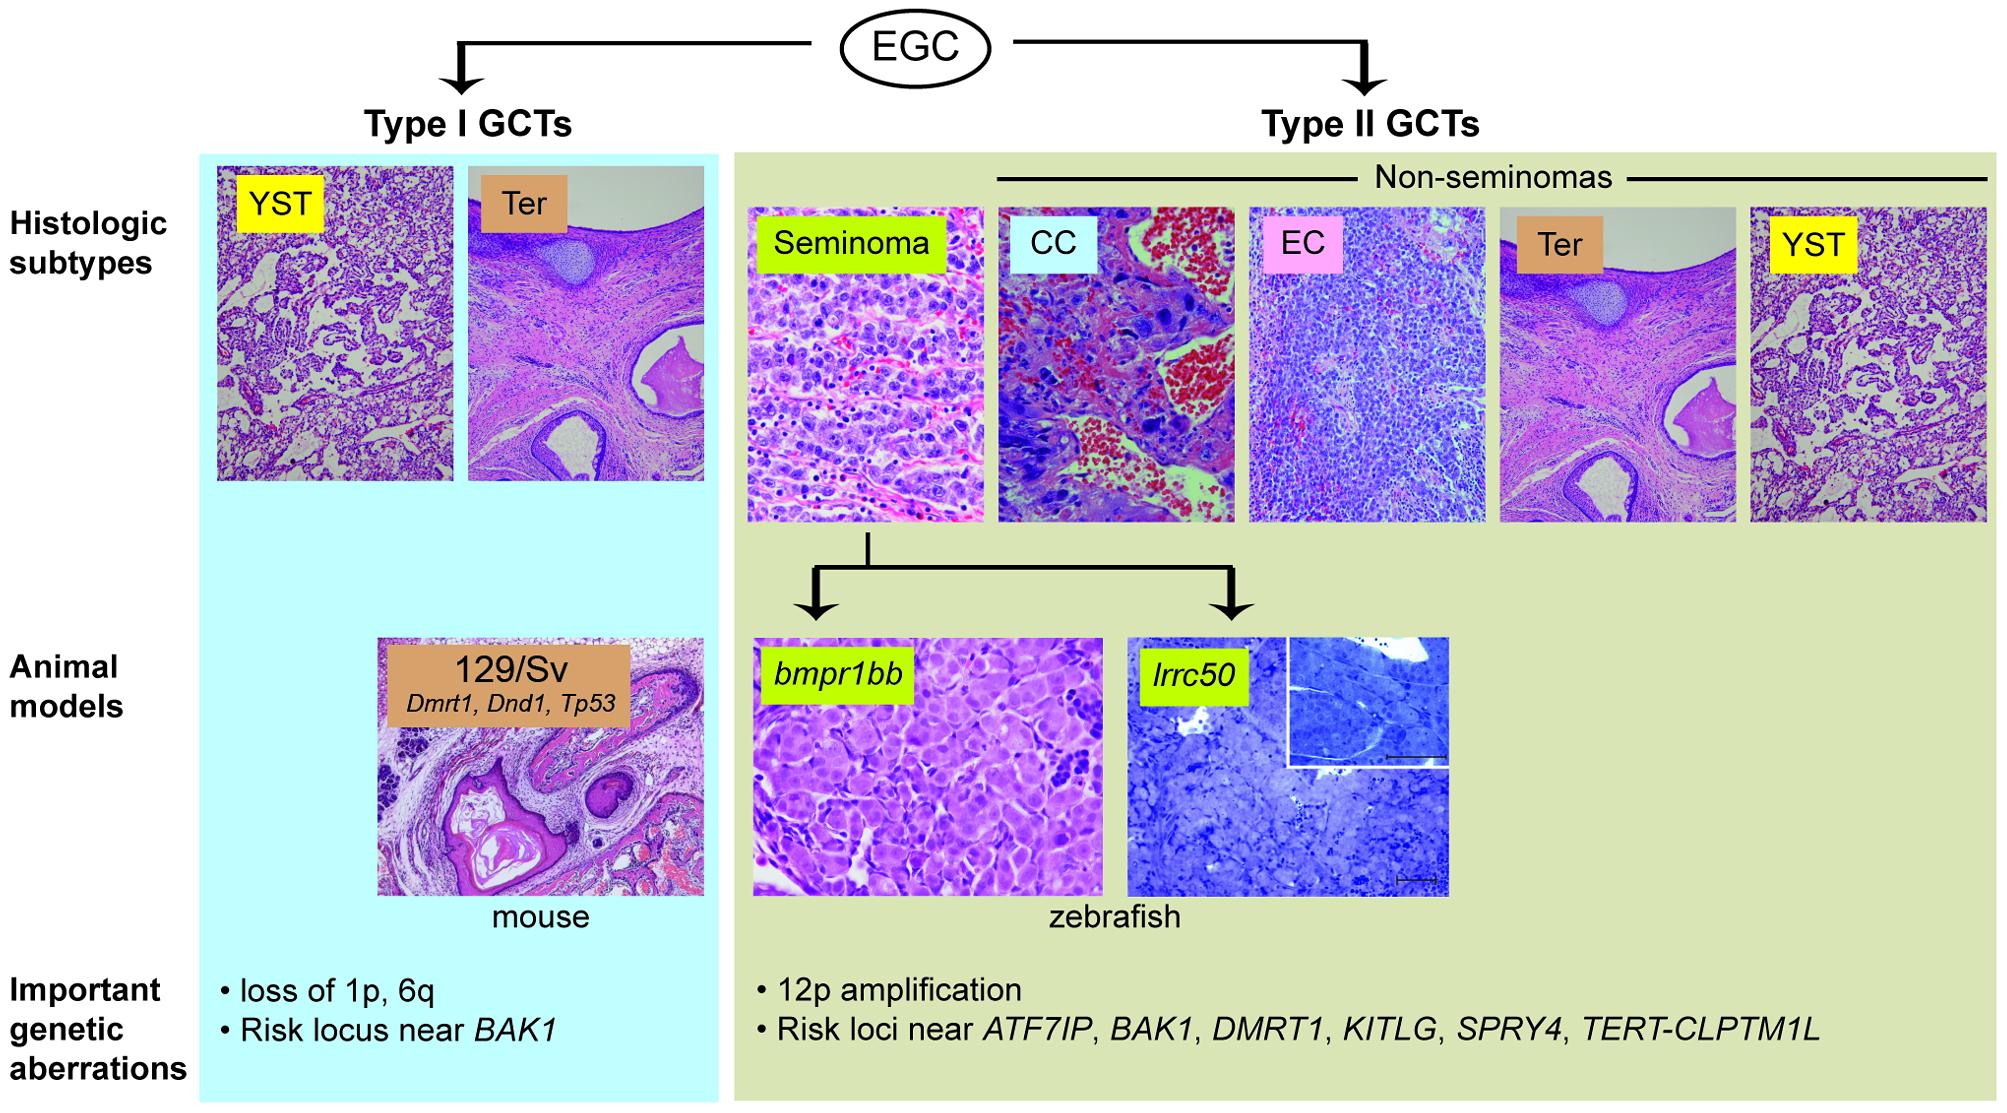 Animal models of TGCT and correlation to human histologic subtypes.